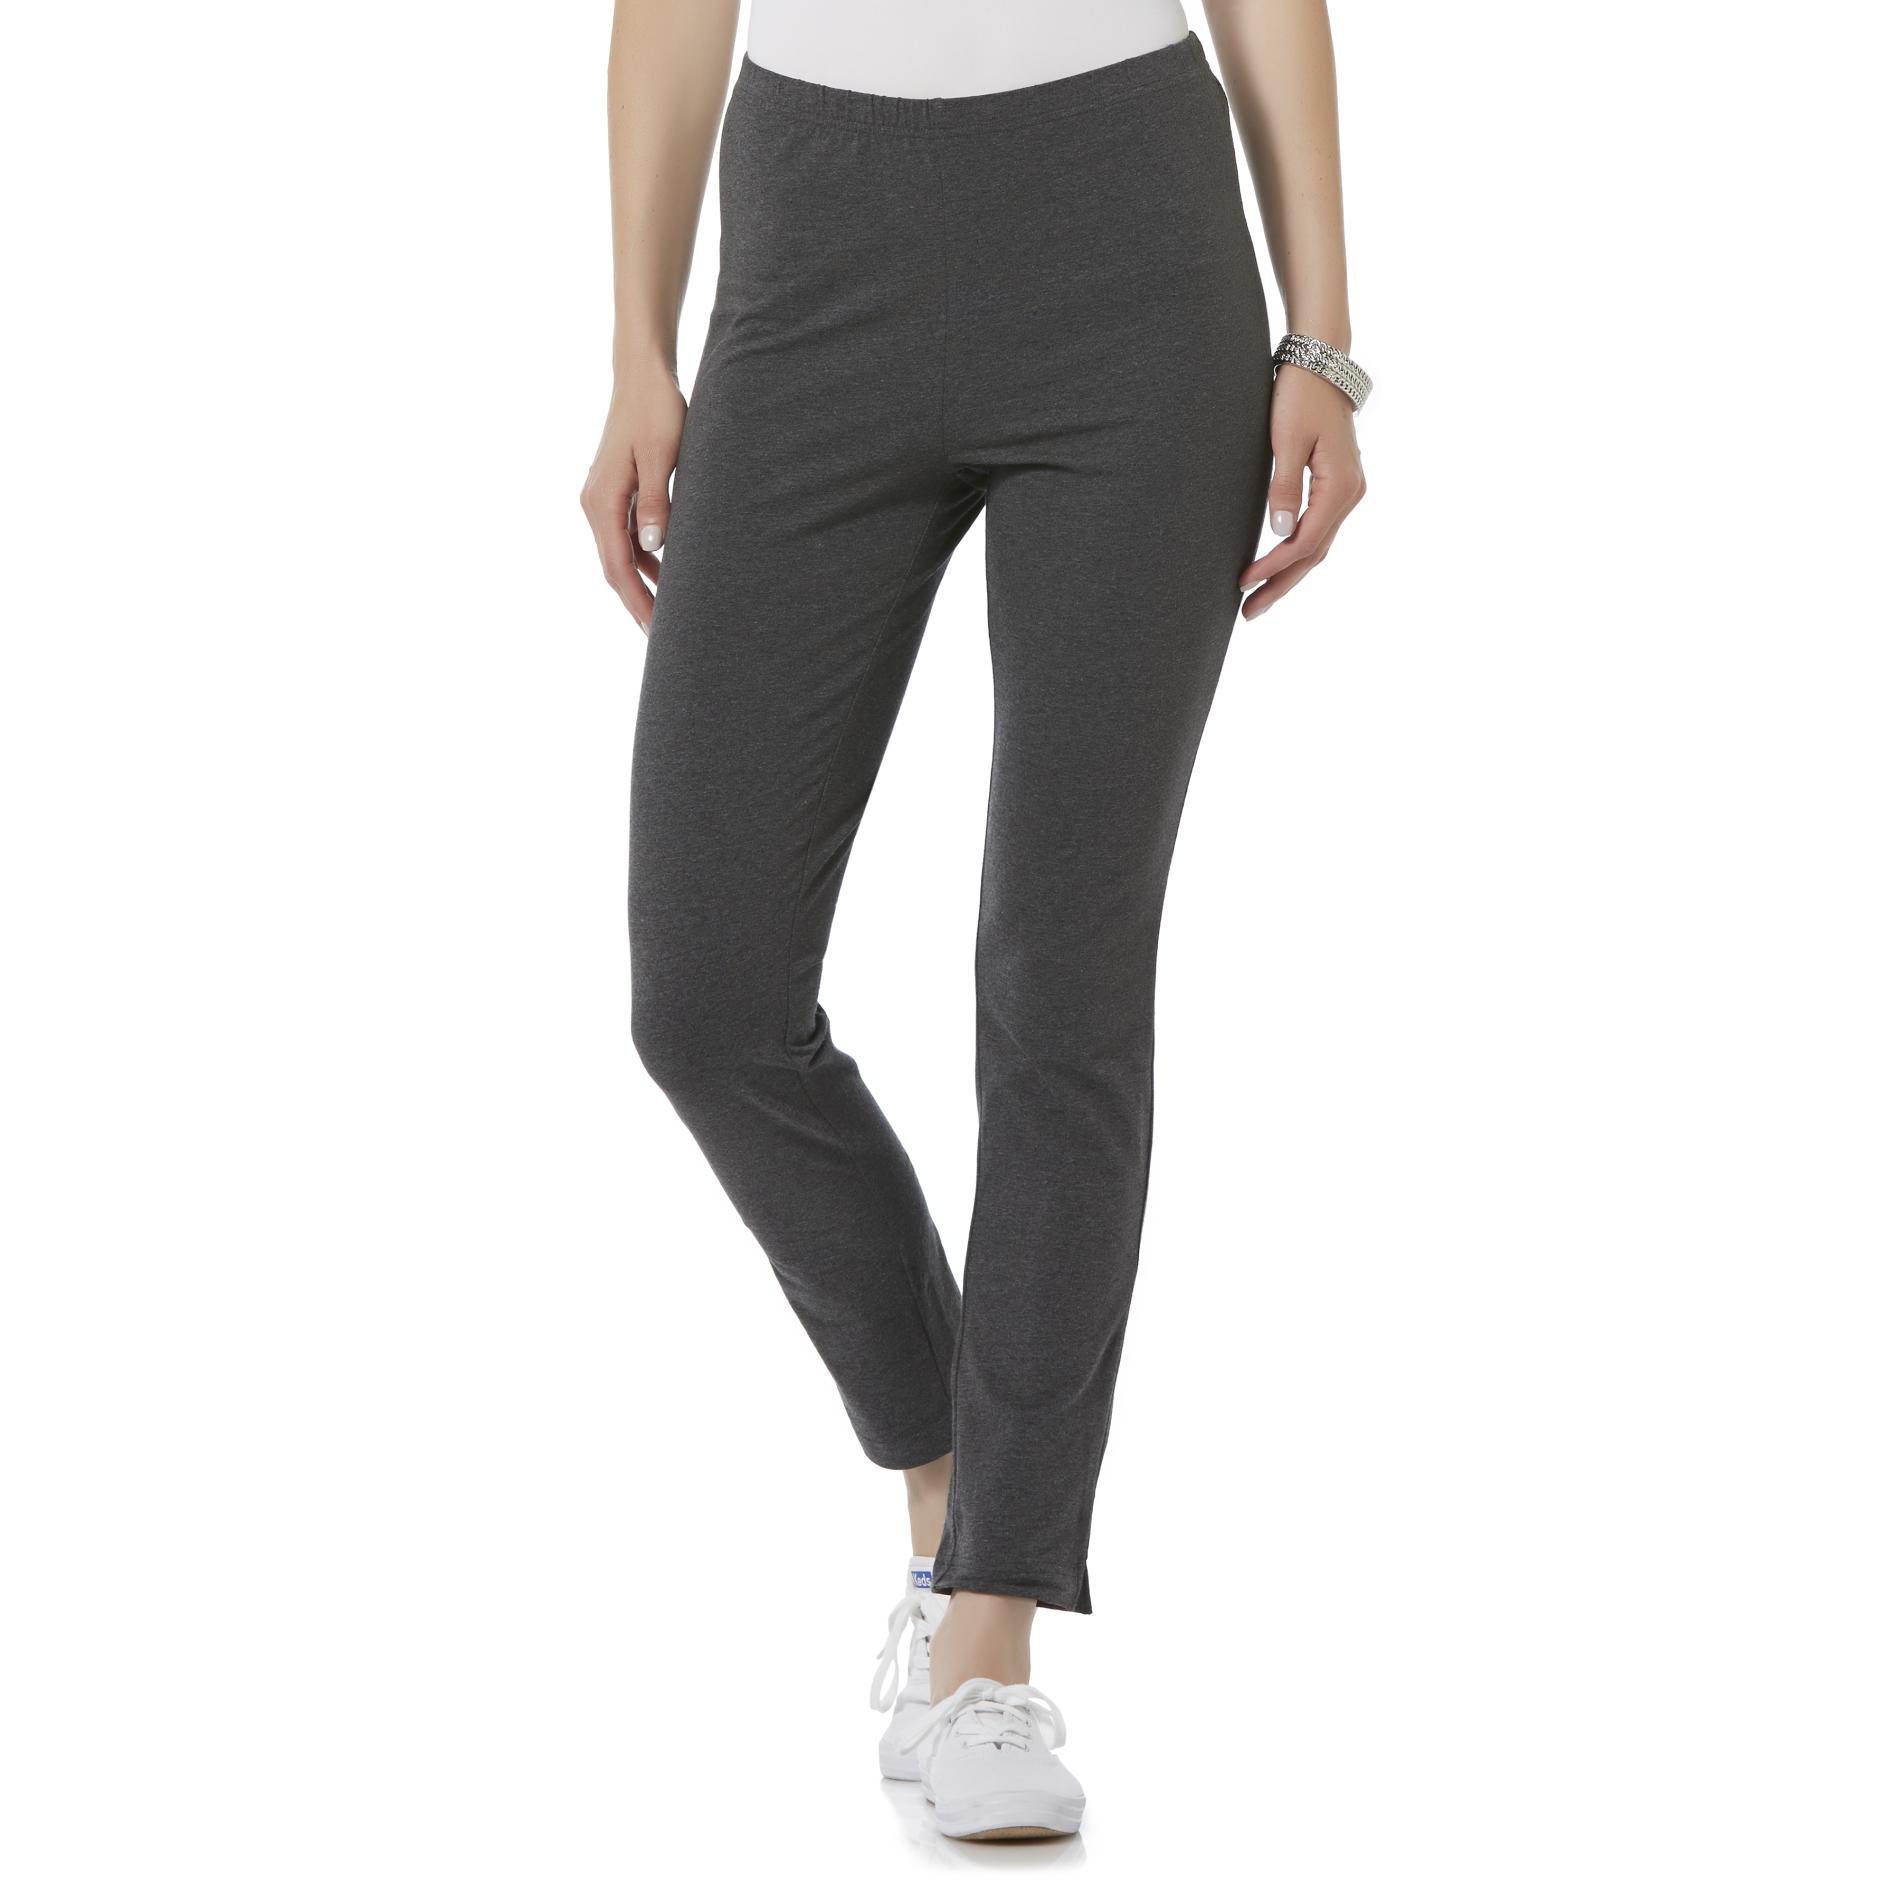 Basic Editions Women' Leggings - Clothing